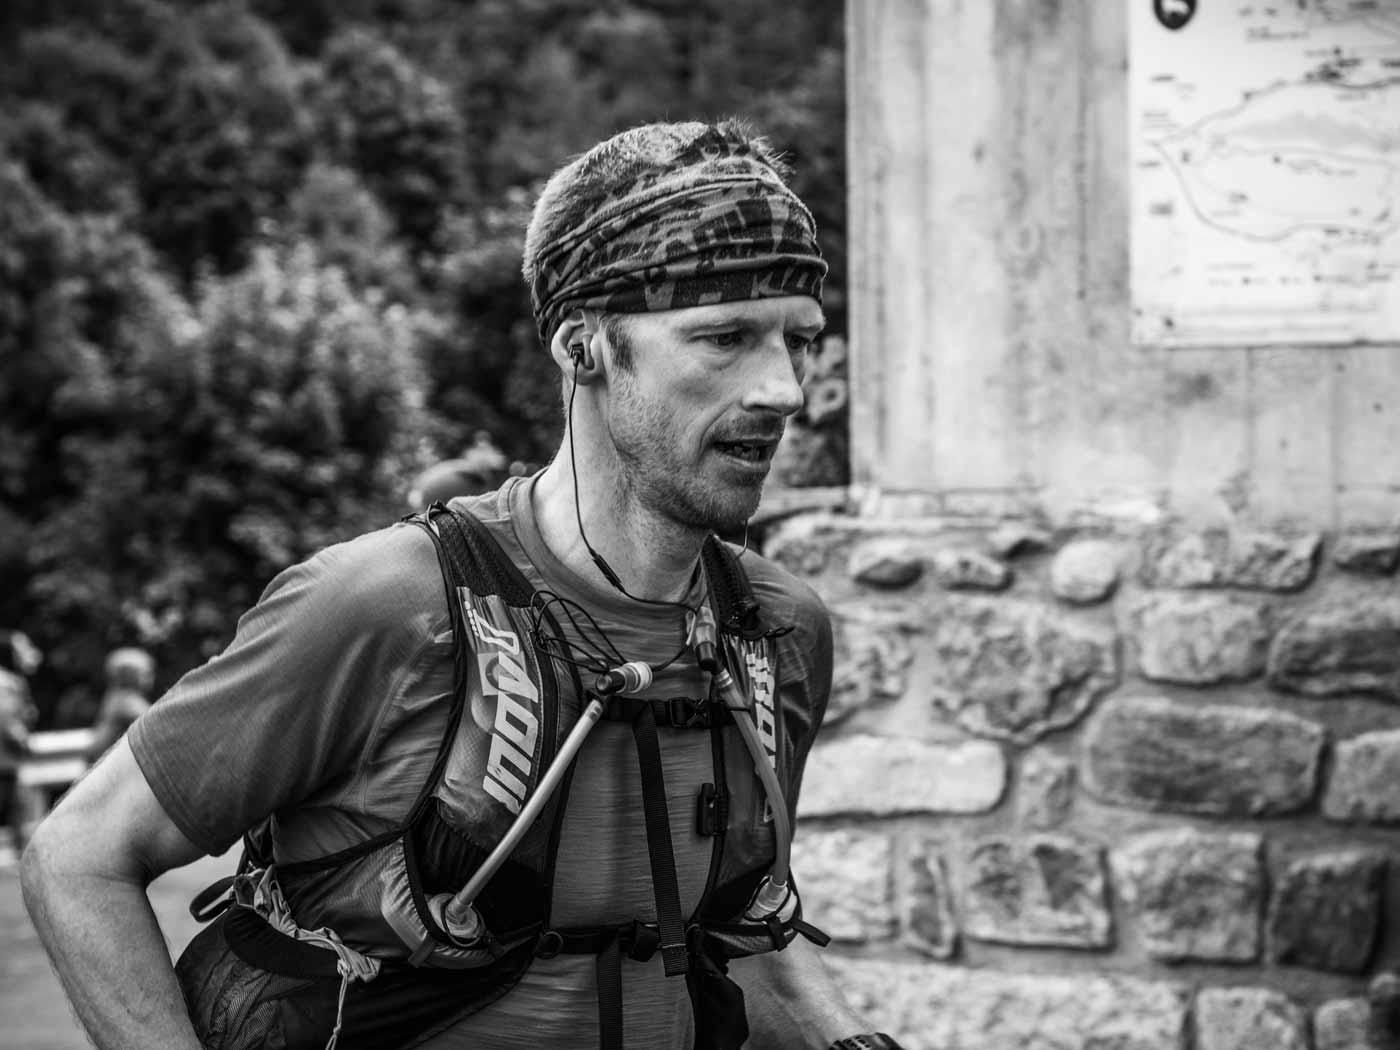 Ultramarathon nutrition - what does an elite ultramarathon runner eat? 2